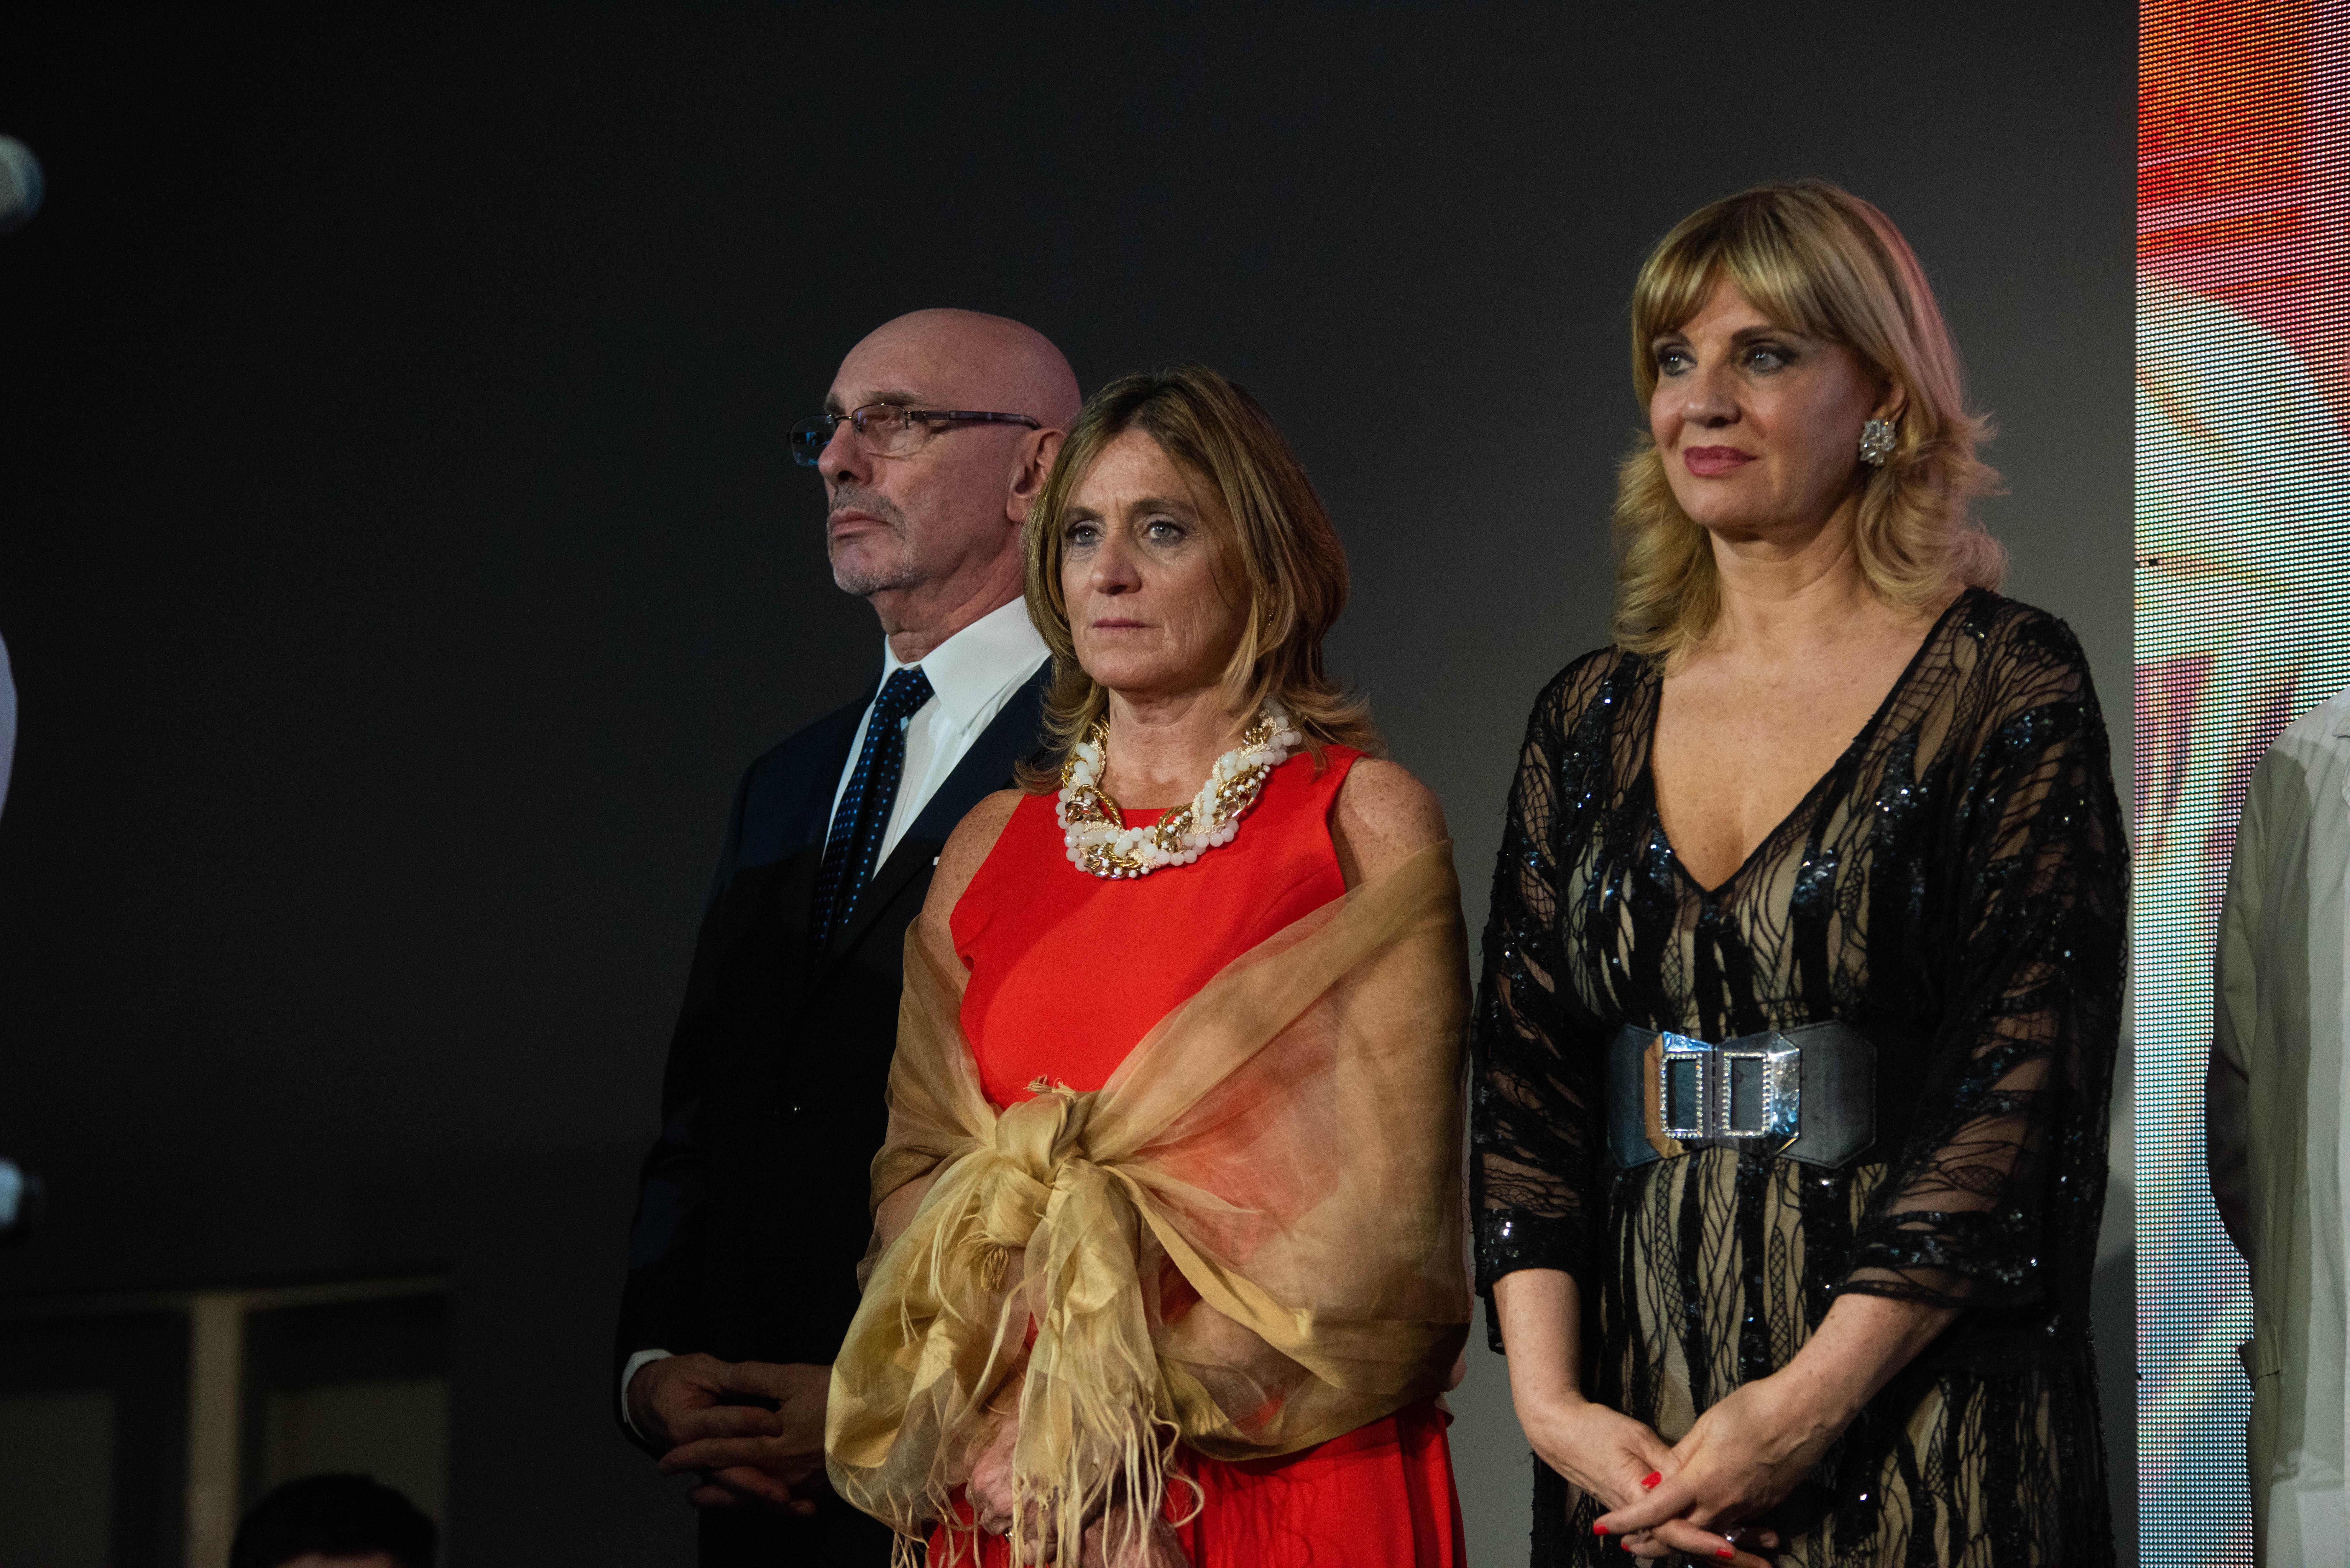 Los conductores de la velada, Eduardo Gálvez y Teté Coustarot, junto a la presidente de COAS, Josefina González Guerrico